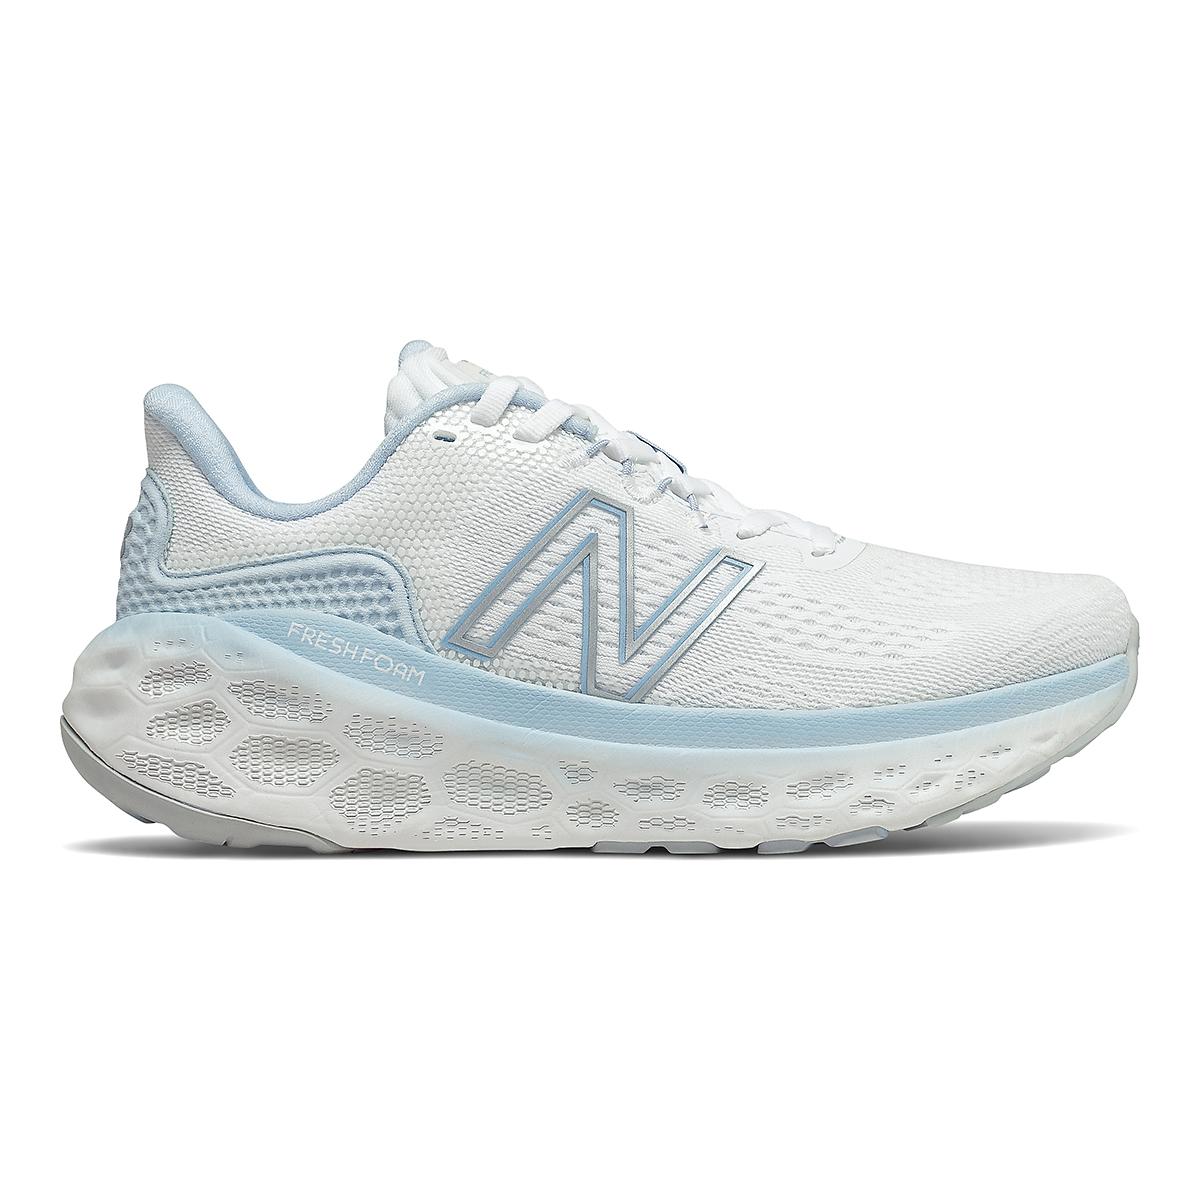 Women's New Balance More V3 Running Shoe - Color: White/Uv Glo - Size: 5 - Width: Extra Wide, White/Uv Glo, large, image 1